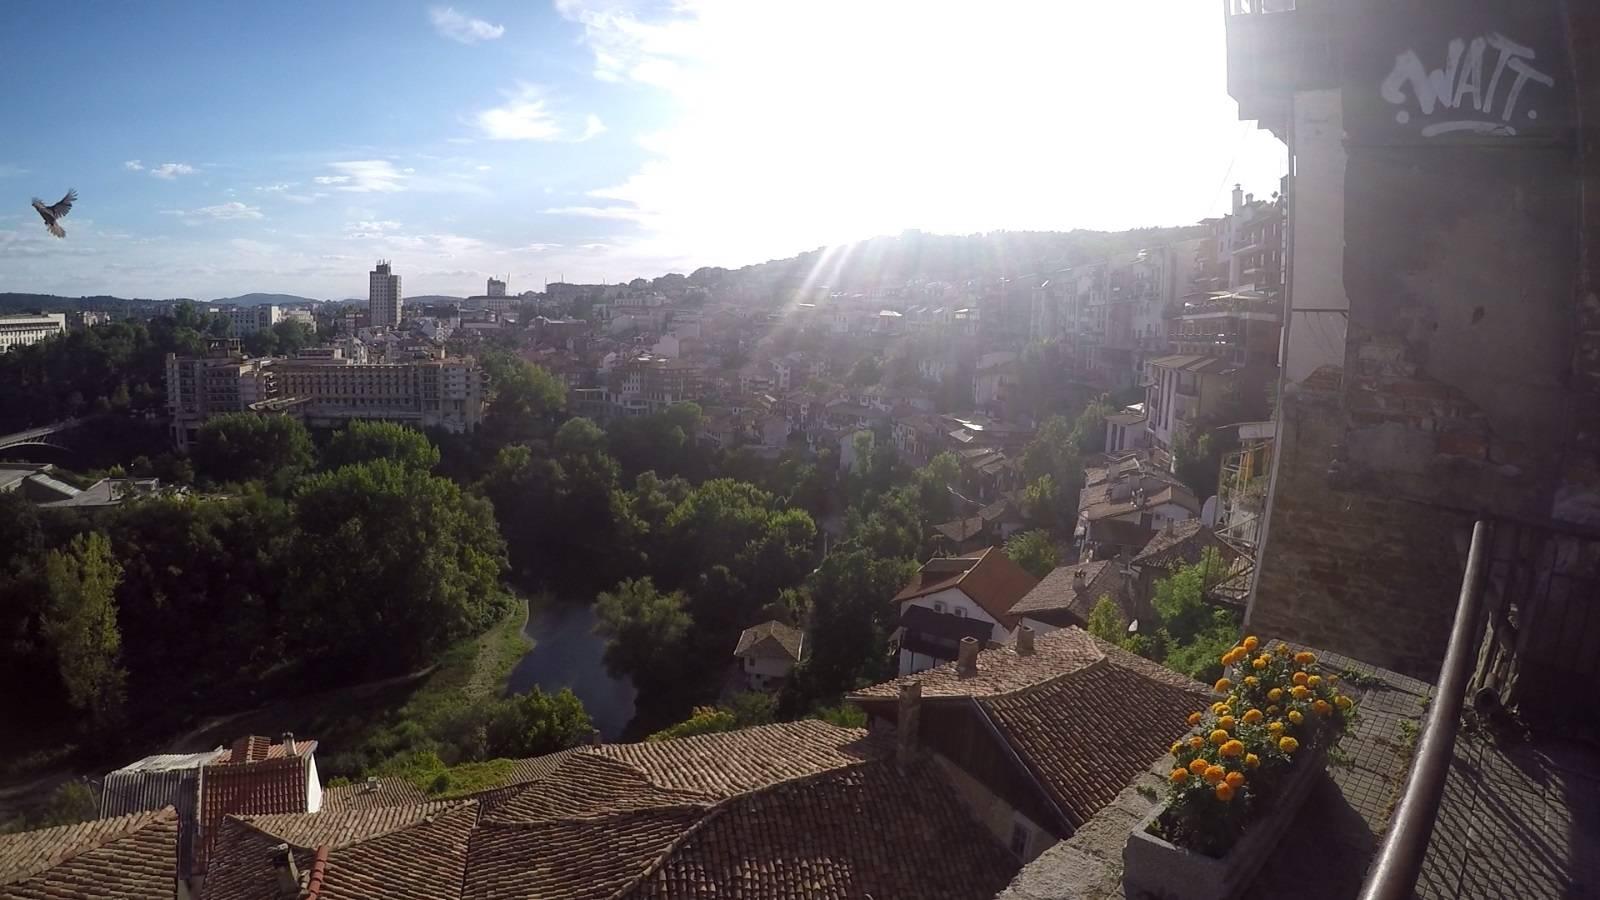 Photo 2: Veliko Tarnovo, ancienne capitale de la Bulgarie